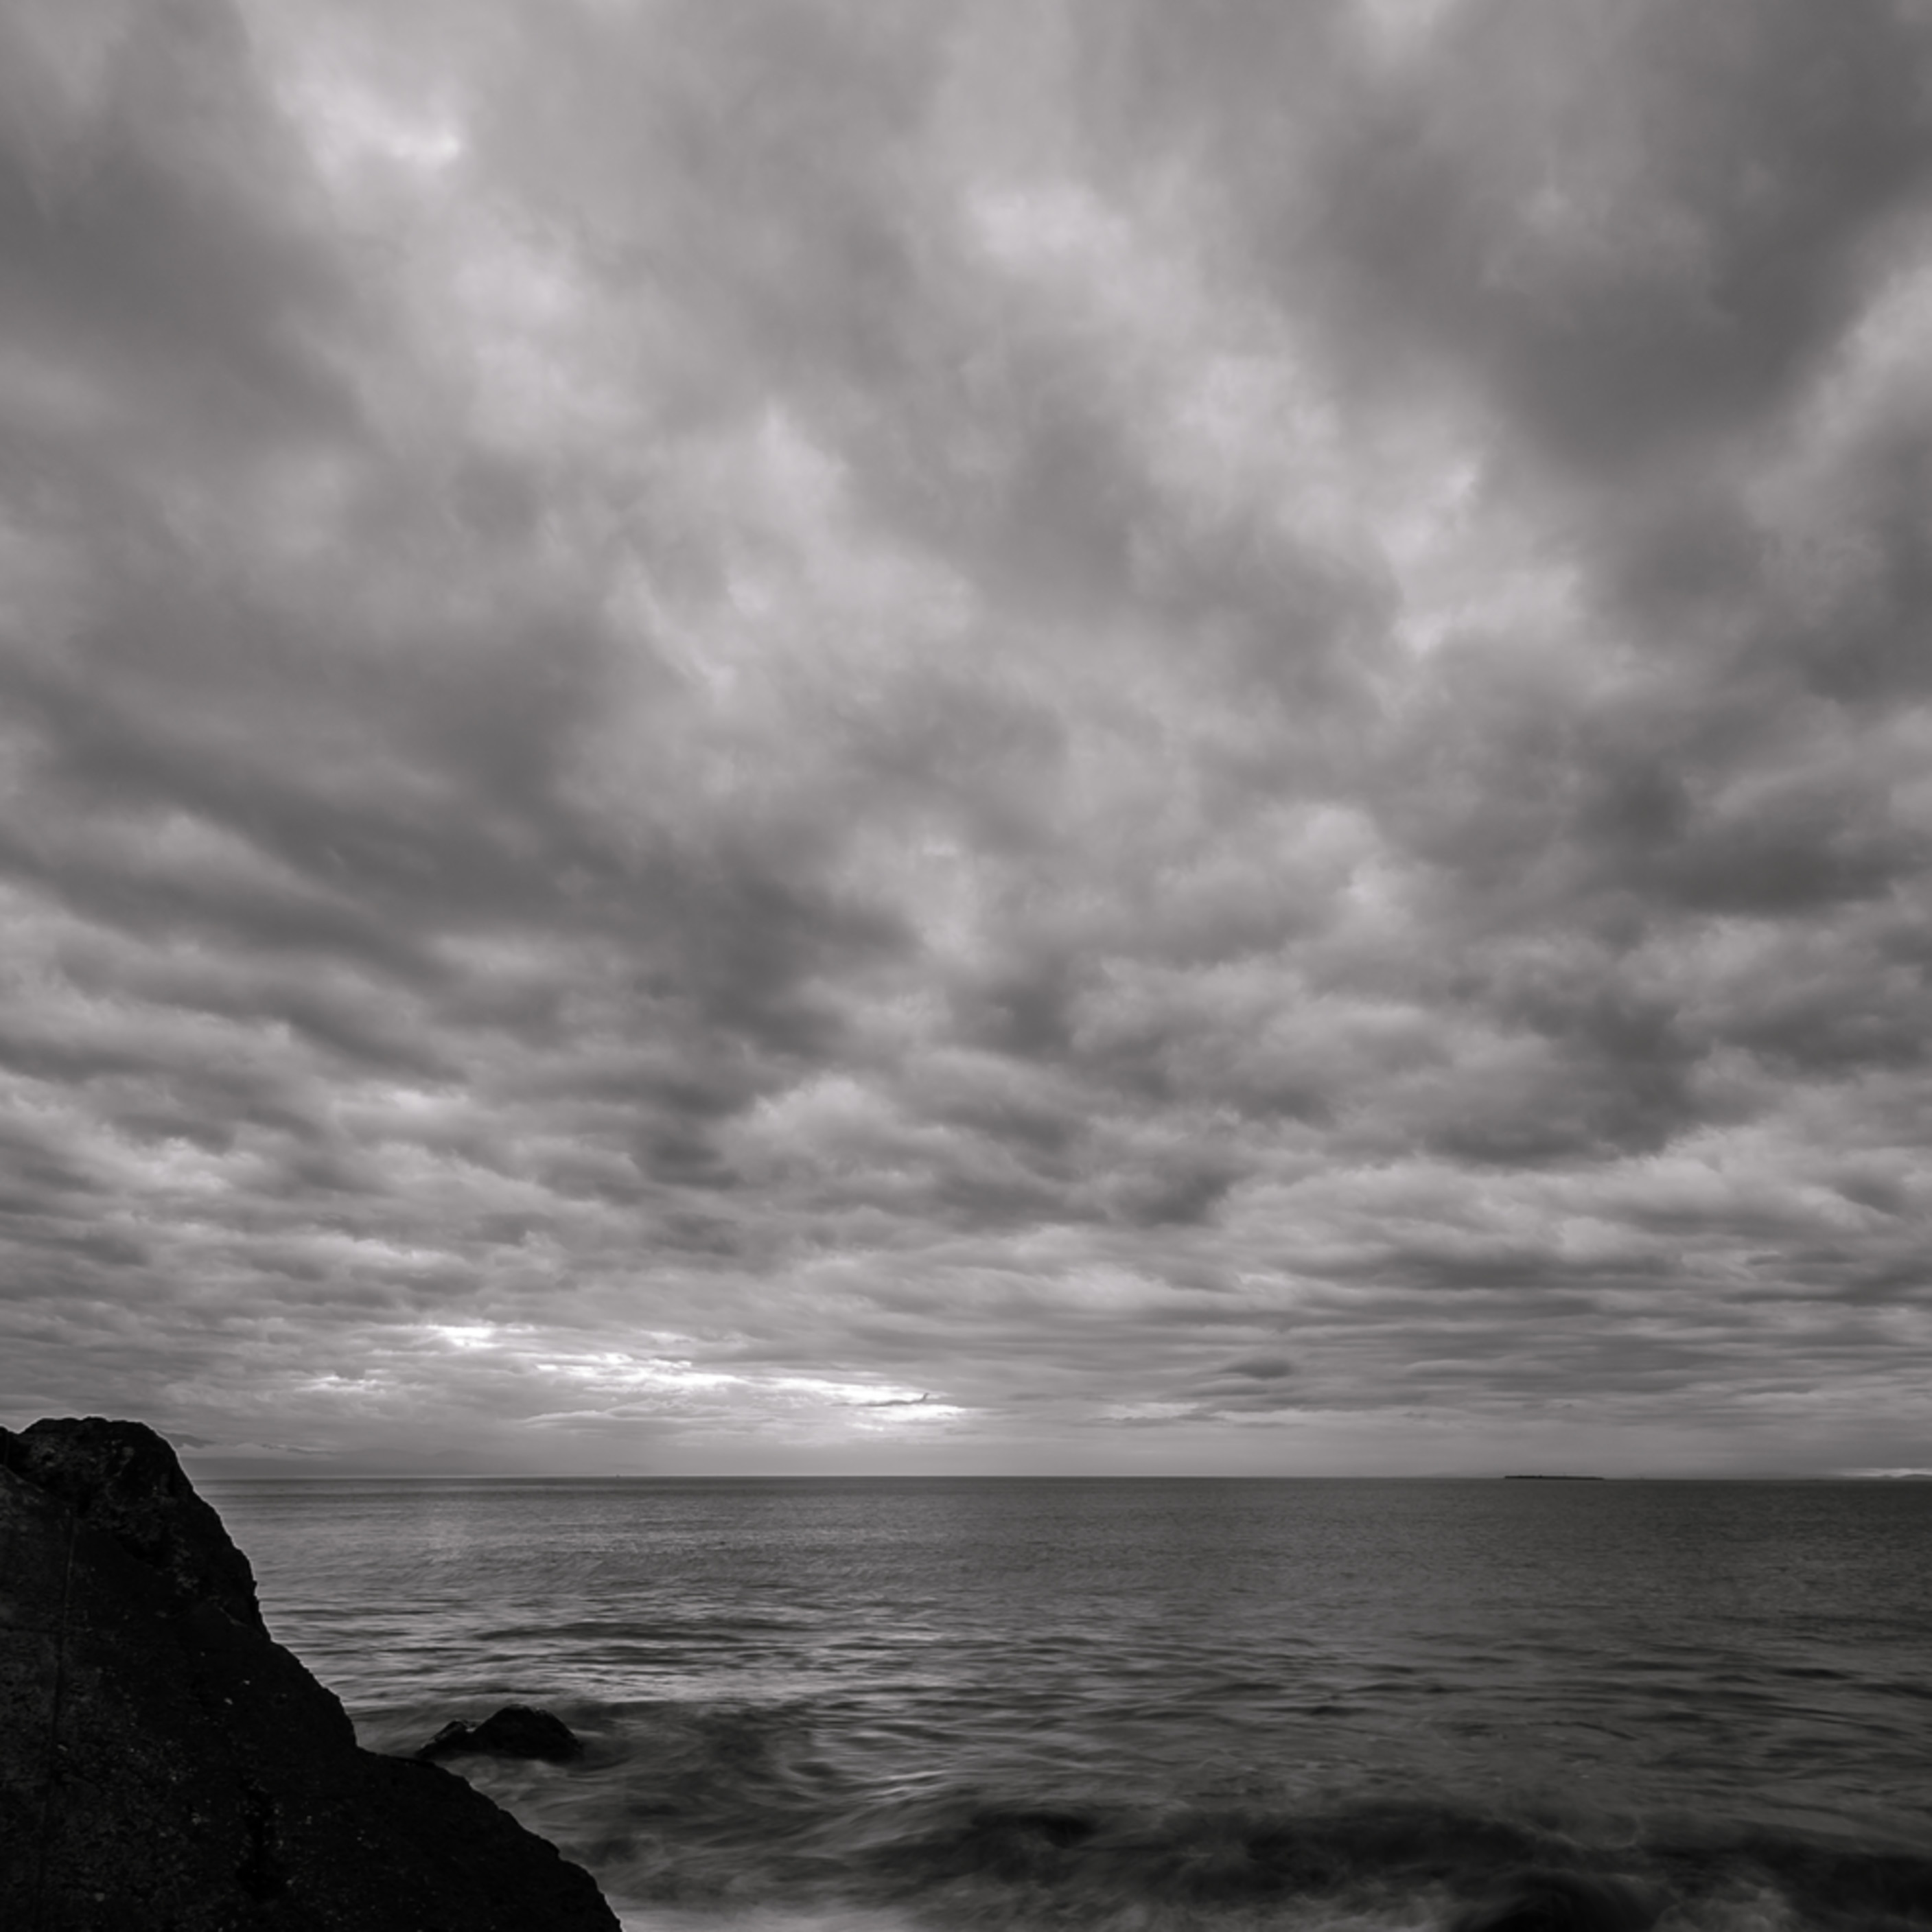 Early autumn skies no 2 west beach whidbey island washington 2017 gcw0ew